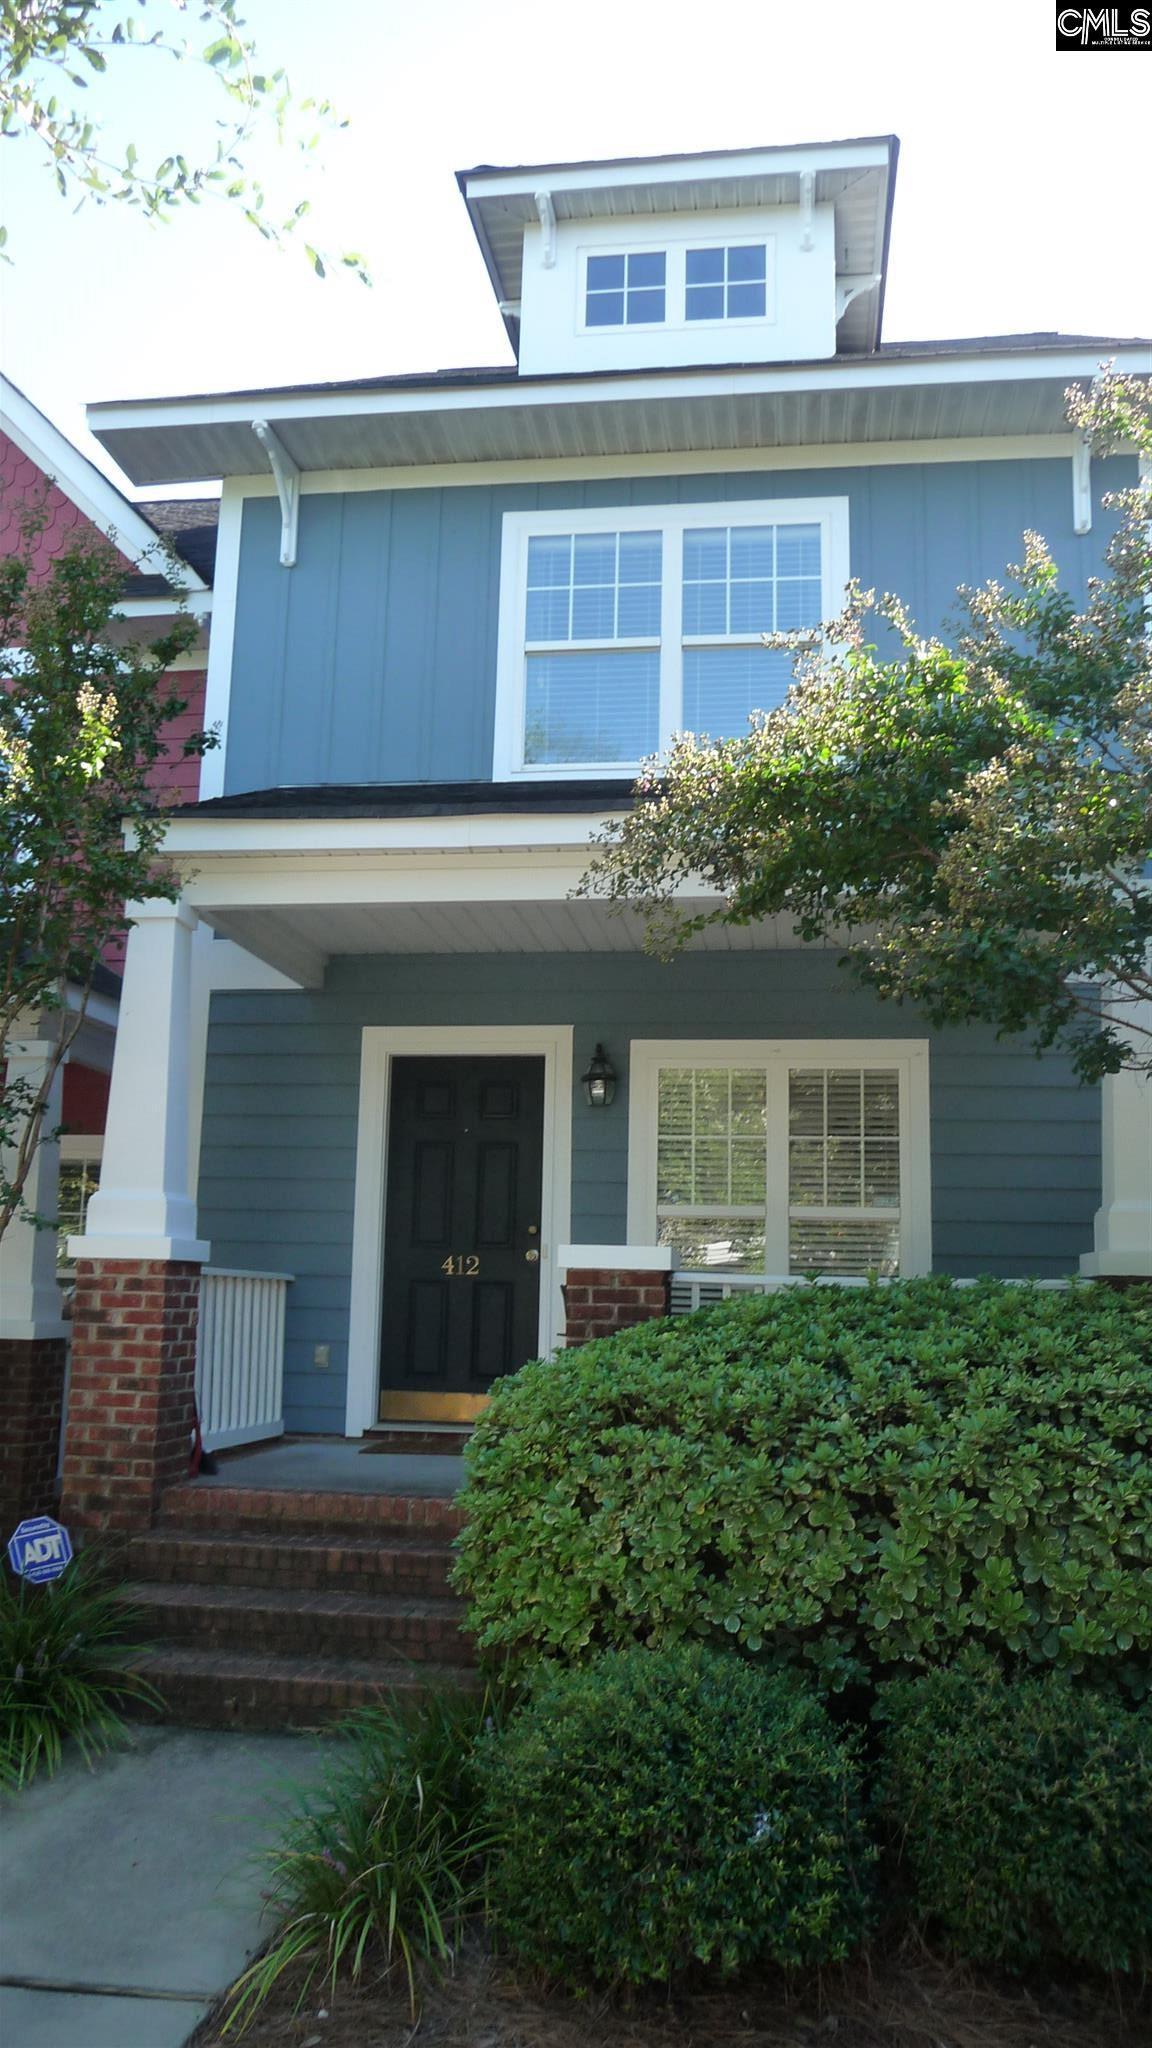 412 Hampton Forest Columbia, SC 29209